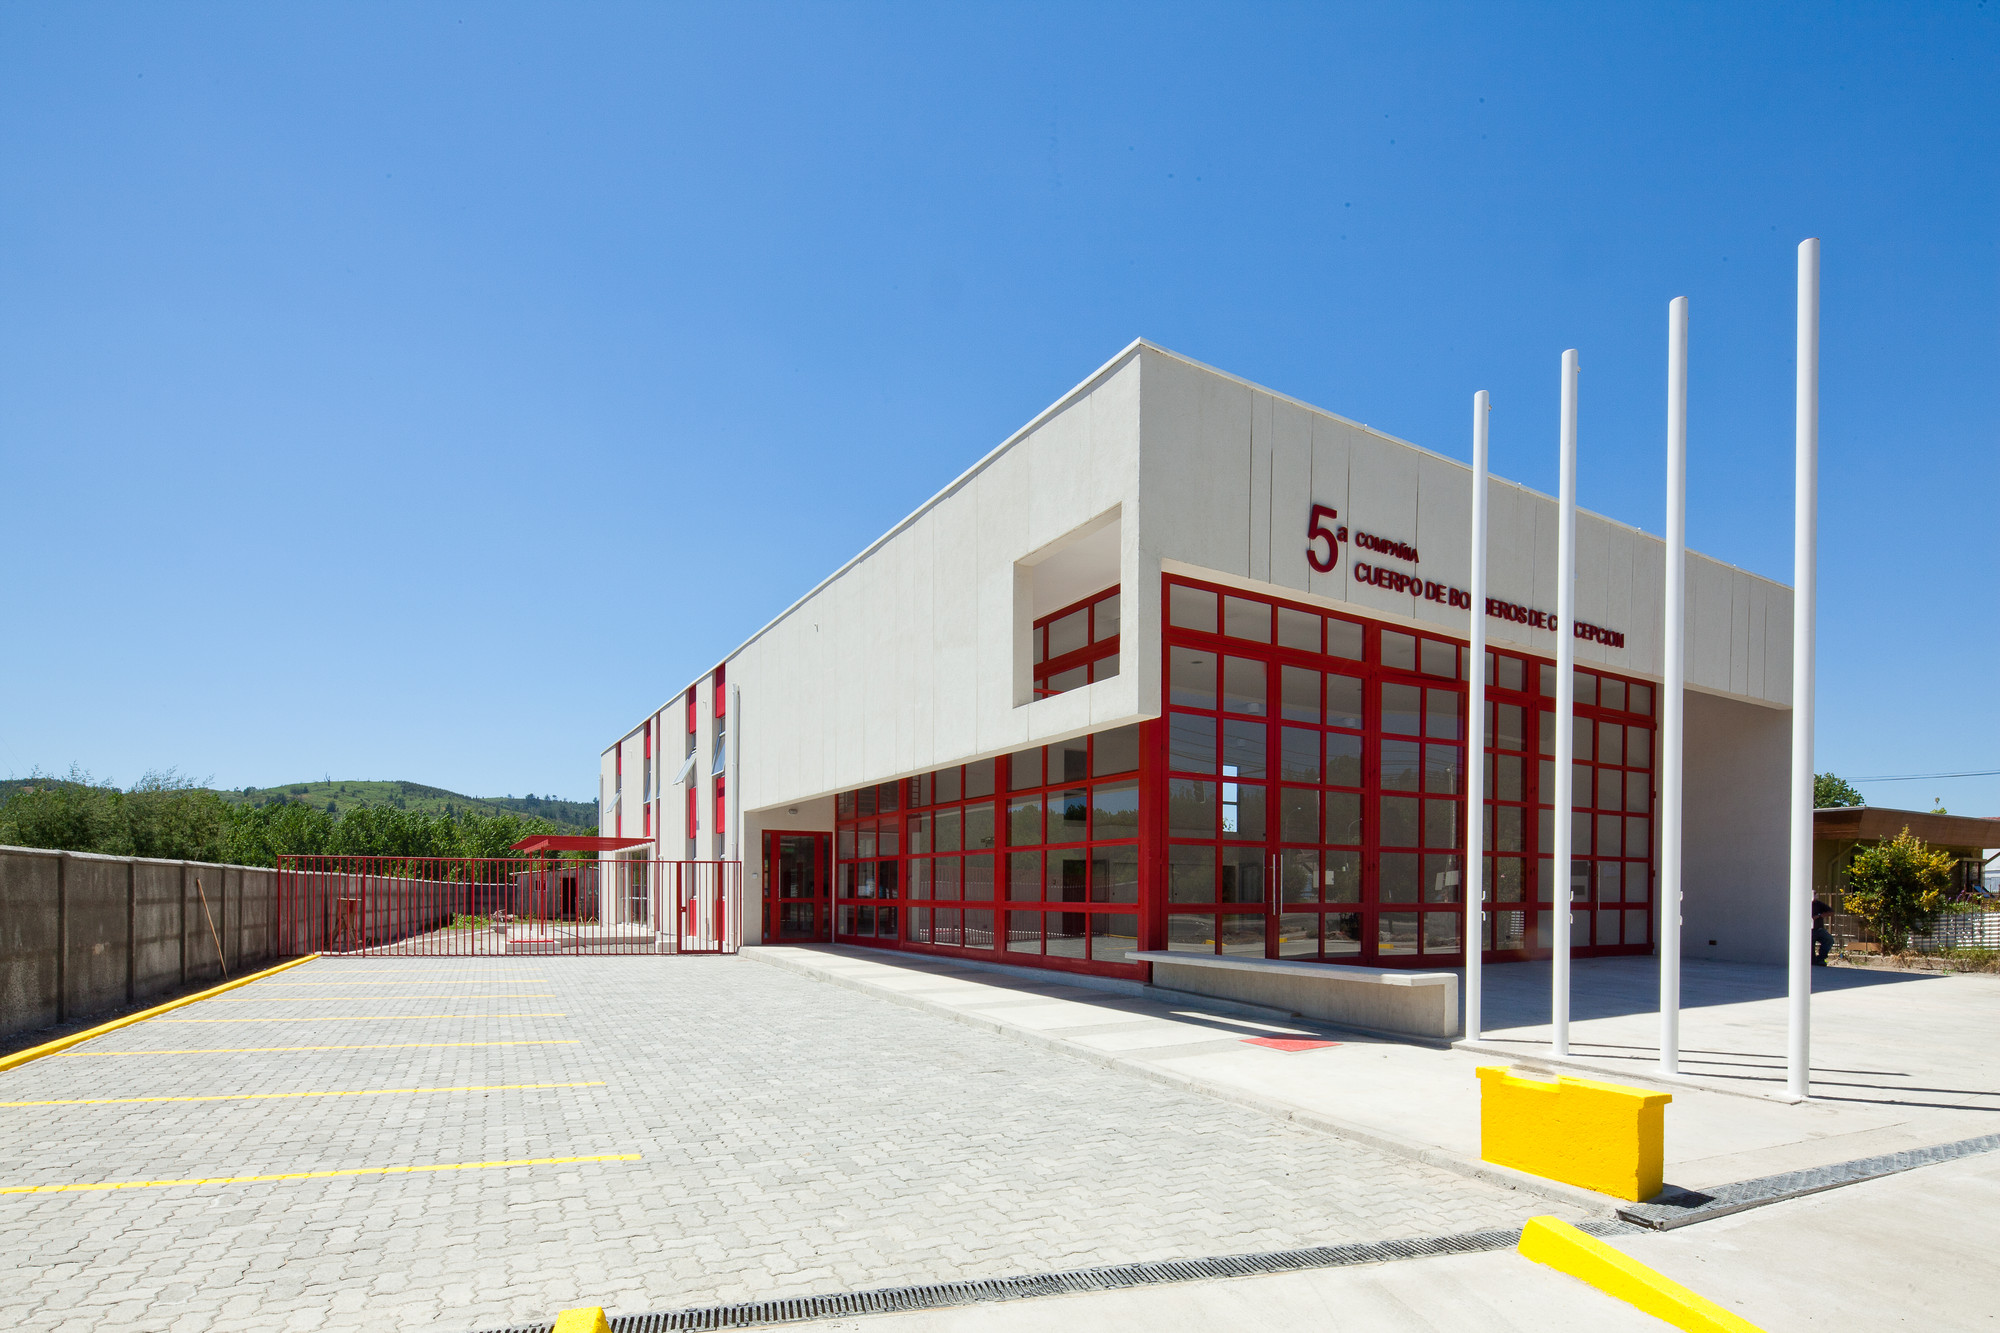 5º Compañía Cuerpo de Bomberos de Concepción / Andreu Arquitectos, © Juan Eduardo Sepúlveda G.